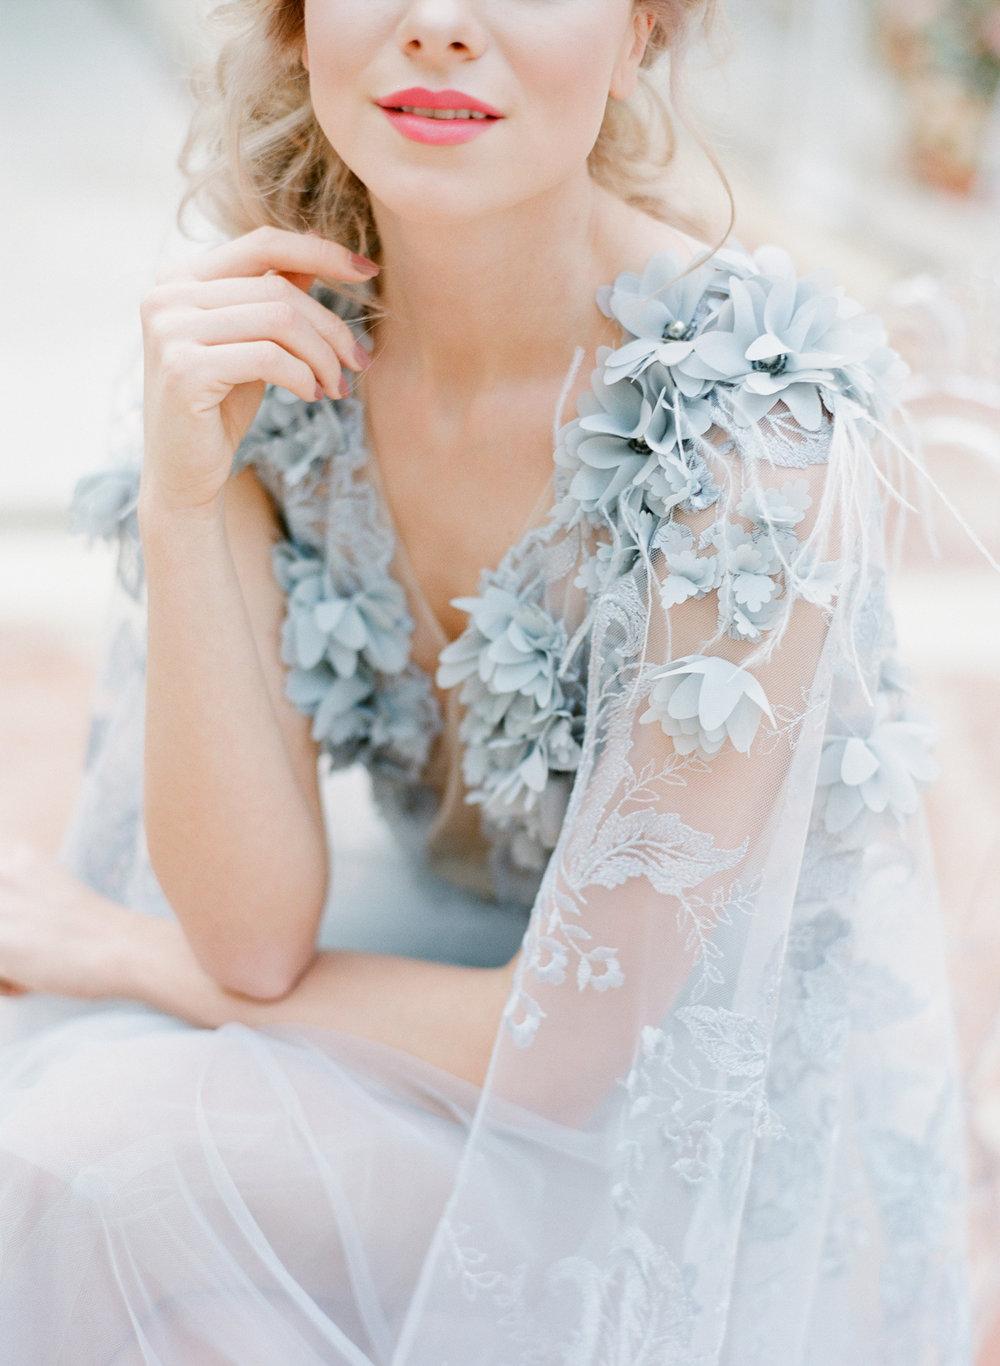 galicia_nueva_wedding_egitorial_nikol_bodnarova_91.JPG